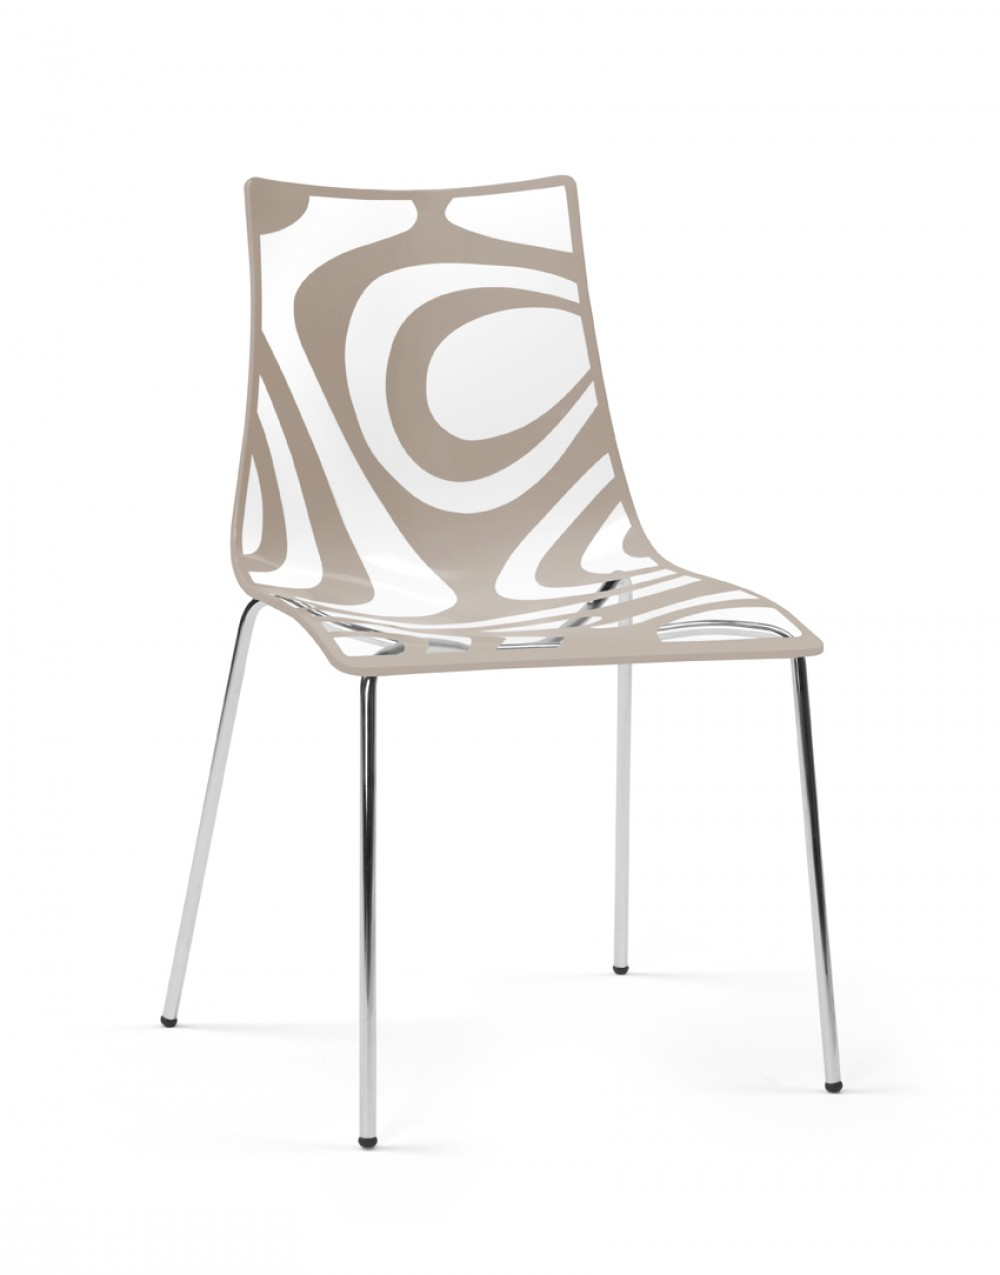 Design stuhl stapelbar stuhl transparent b ro for Stuhl transparent design